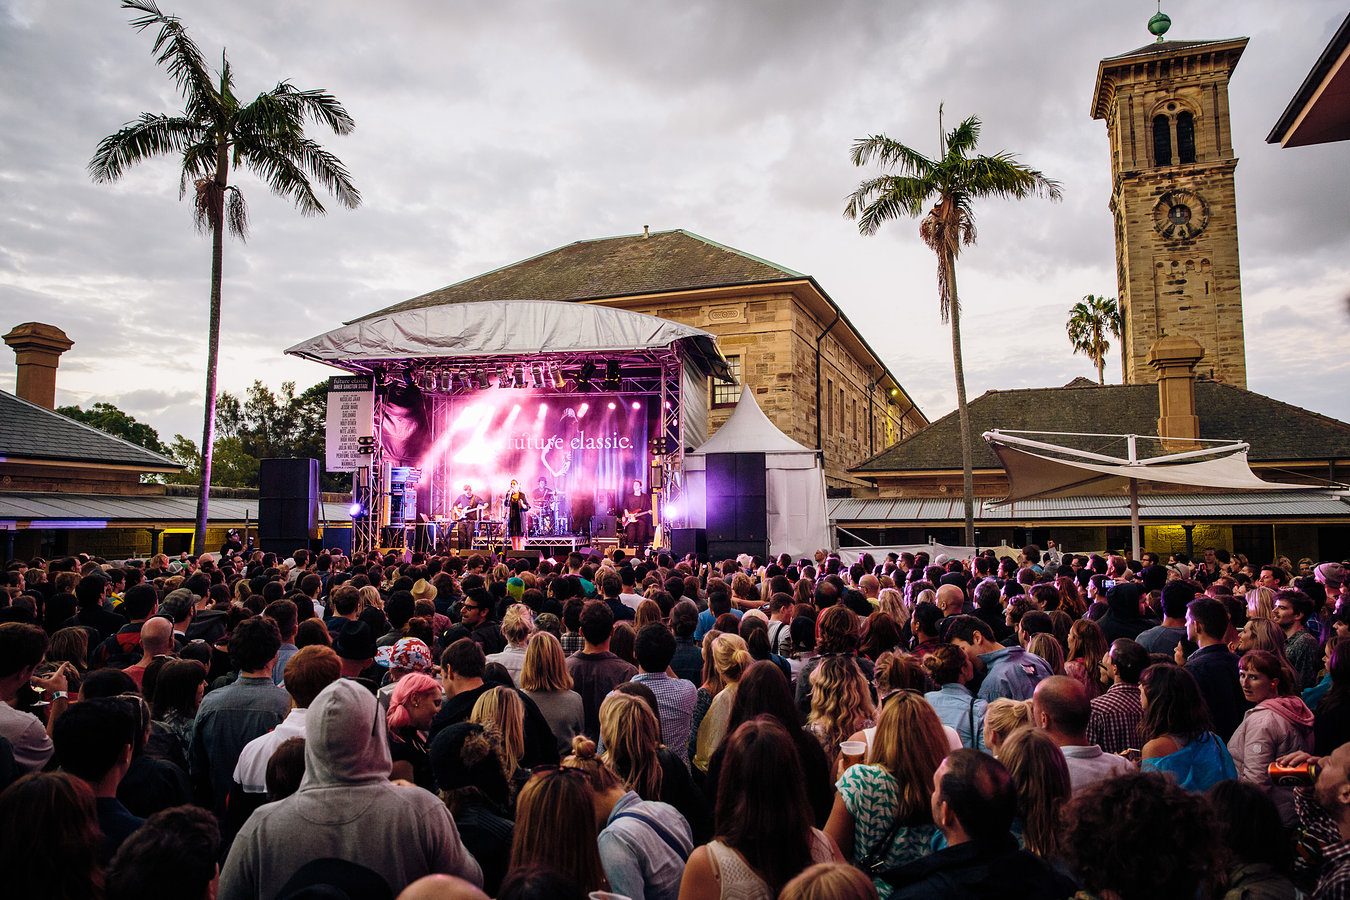 laneway_festival_sydney_201322_website_image_tvff_standard